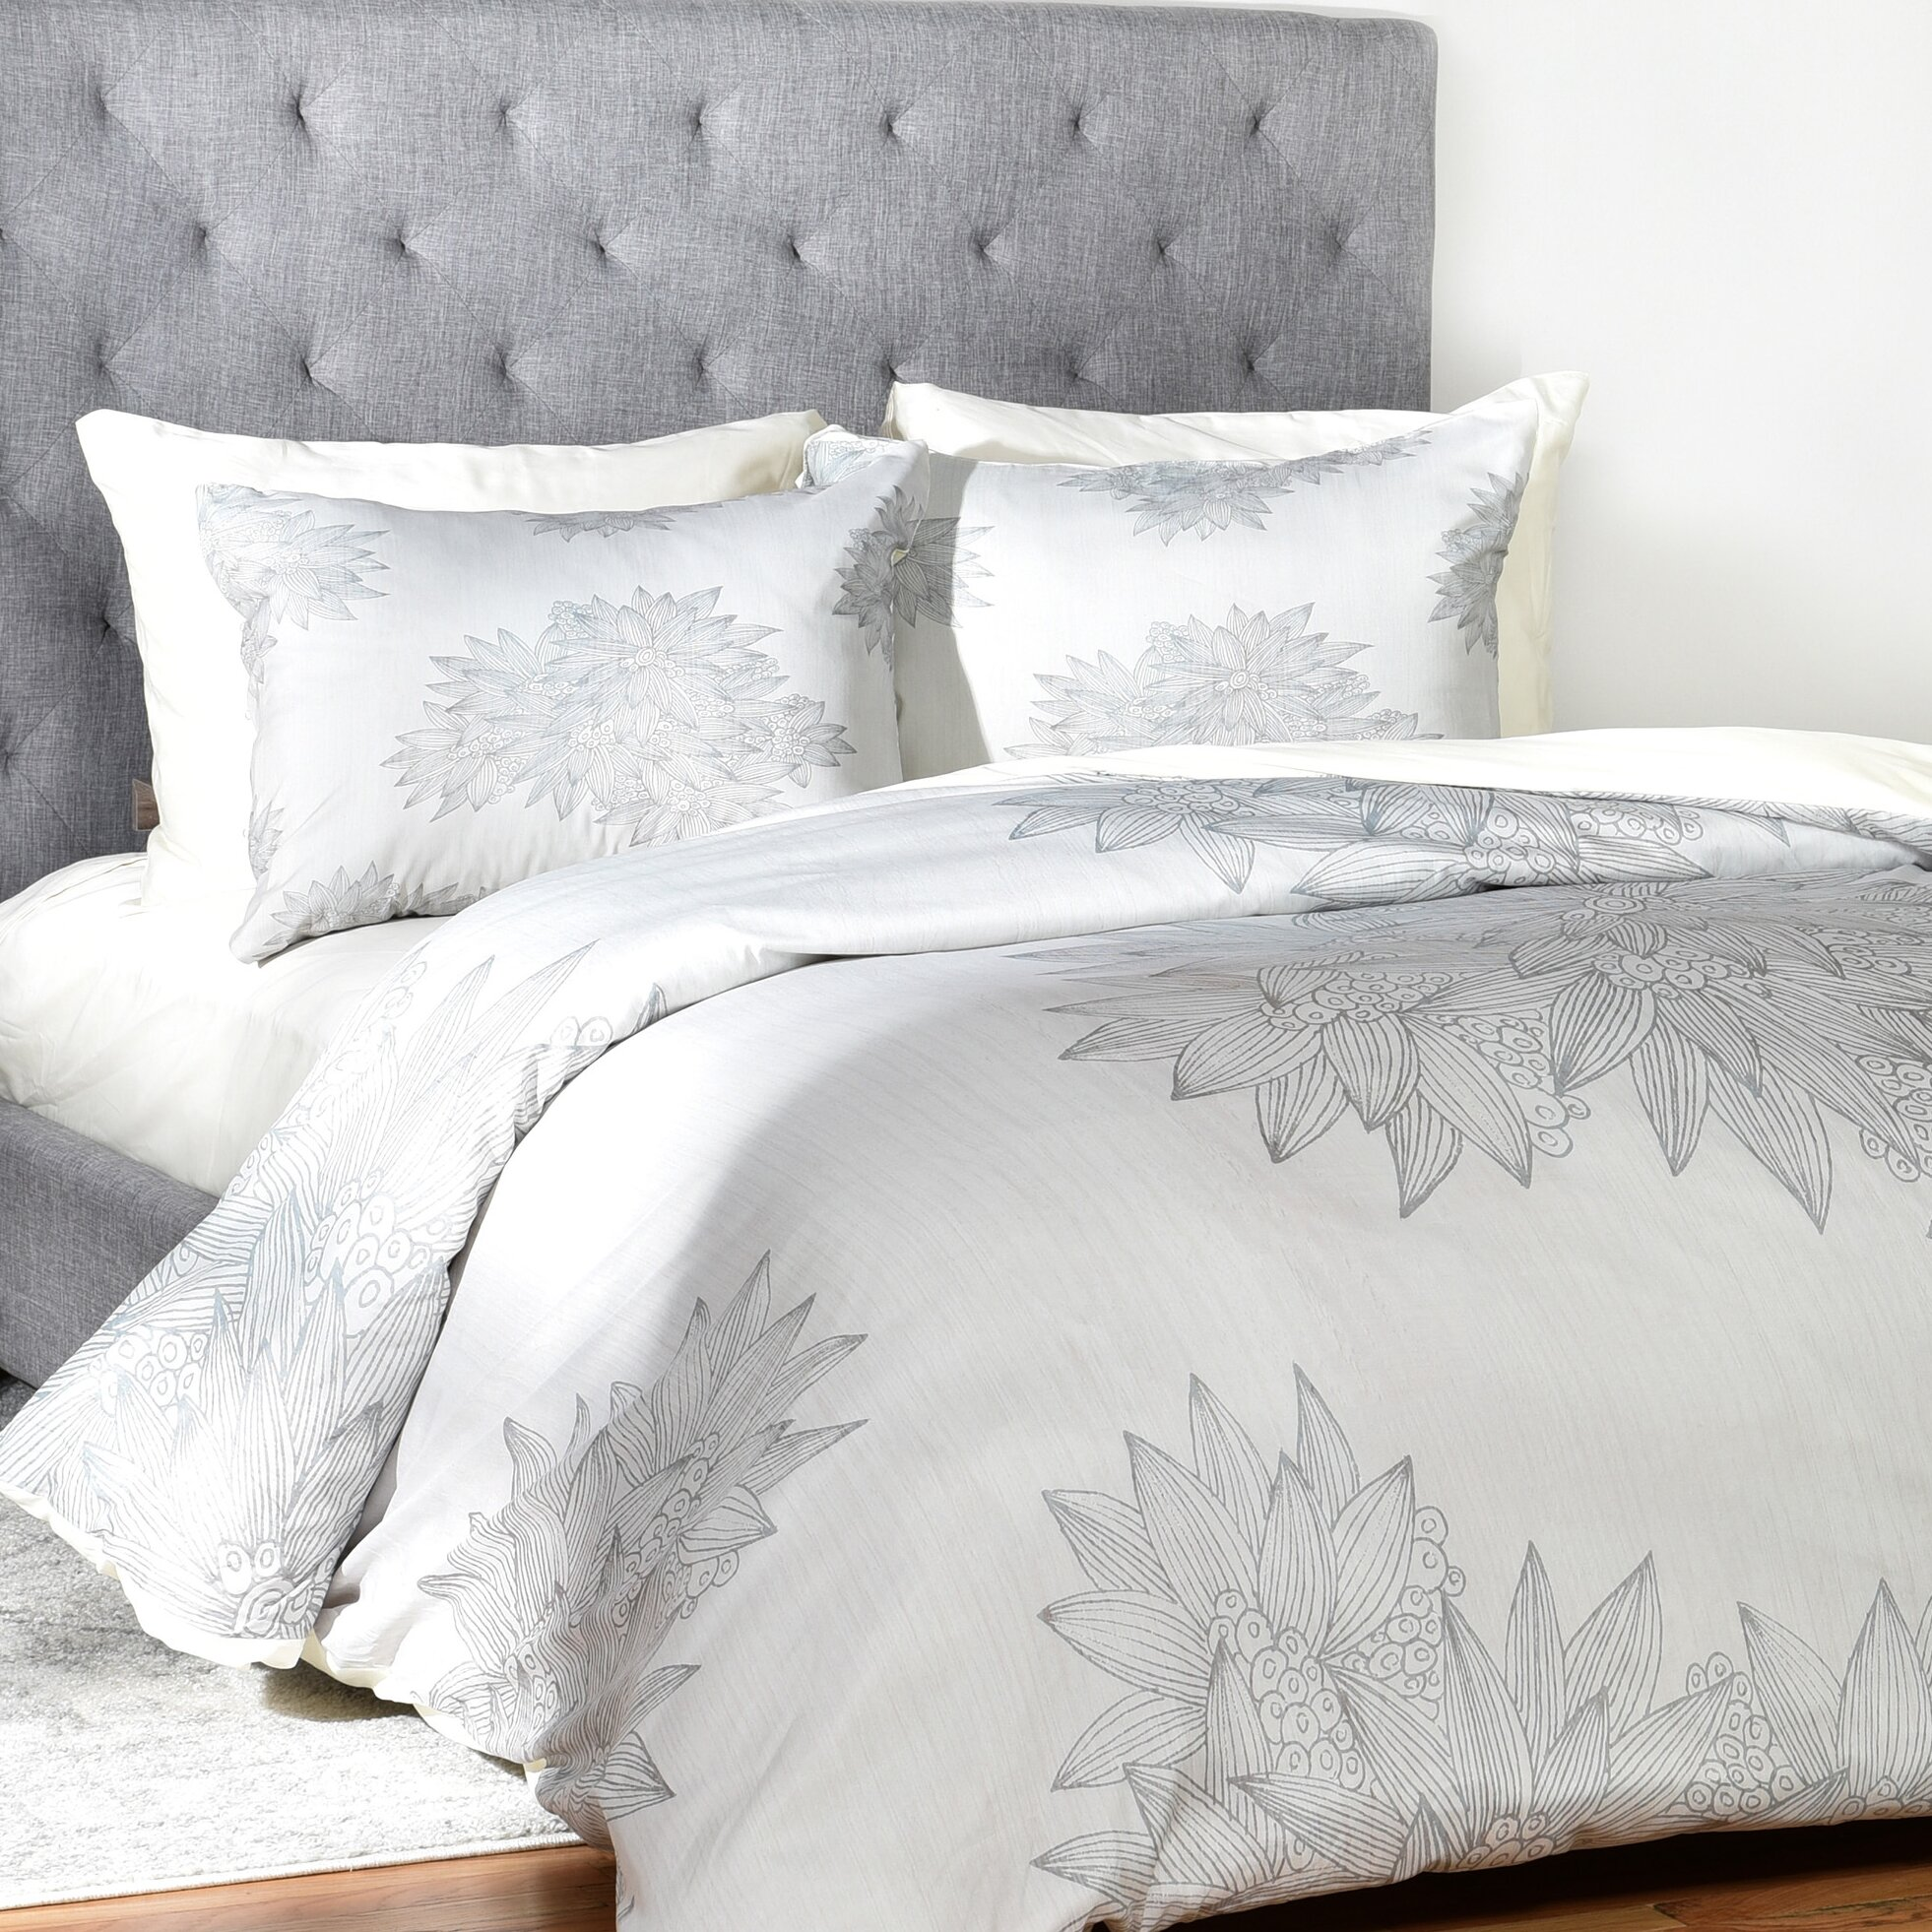 Brayden studio murrow duvet cover reviews wayfair for Studio one bed cover